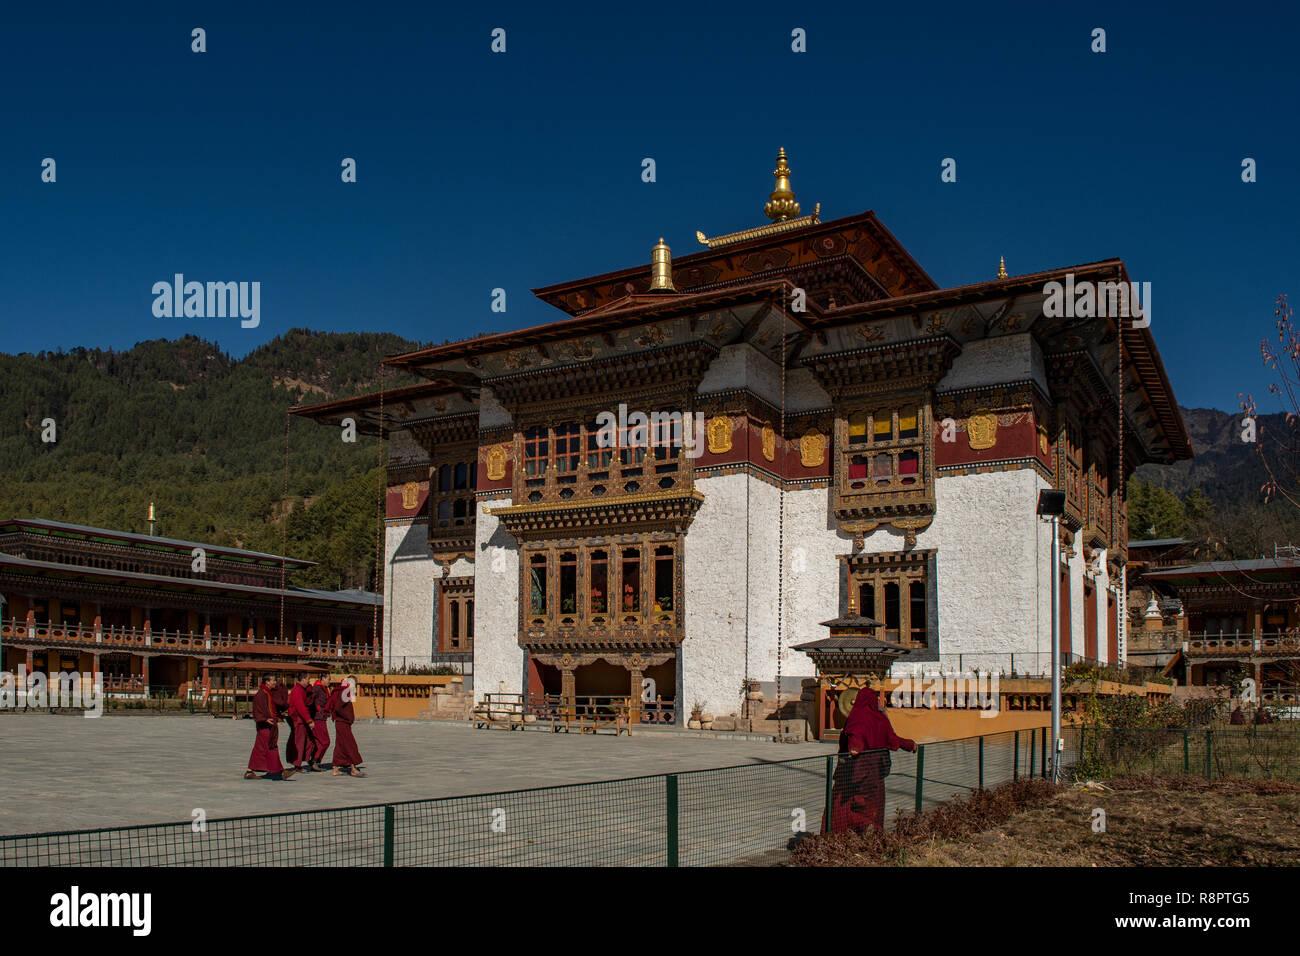 Kenchosum Lhakhang, Bumthang, Bhutan - Stock Image